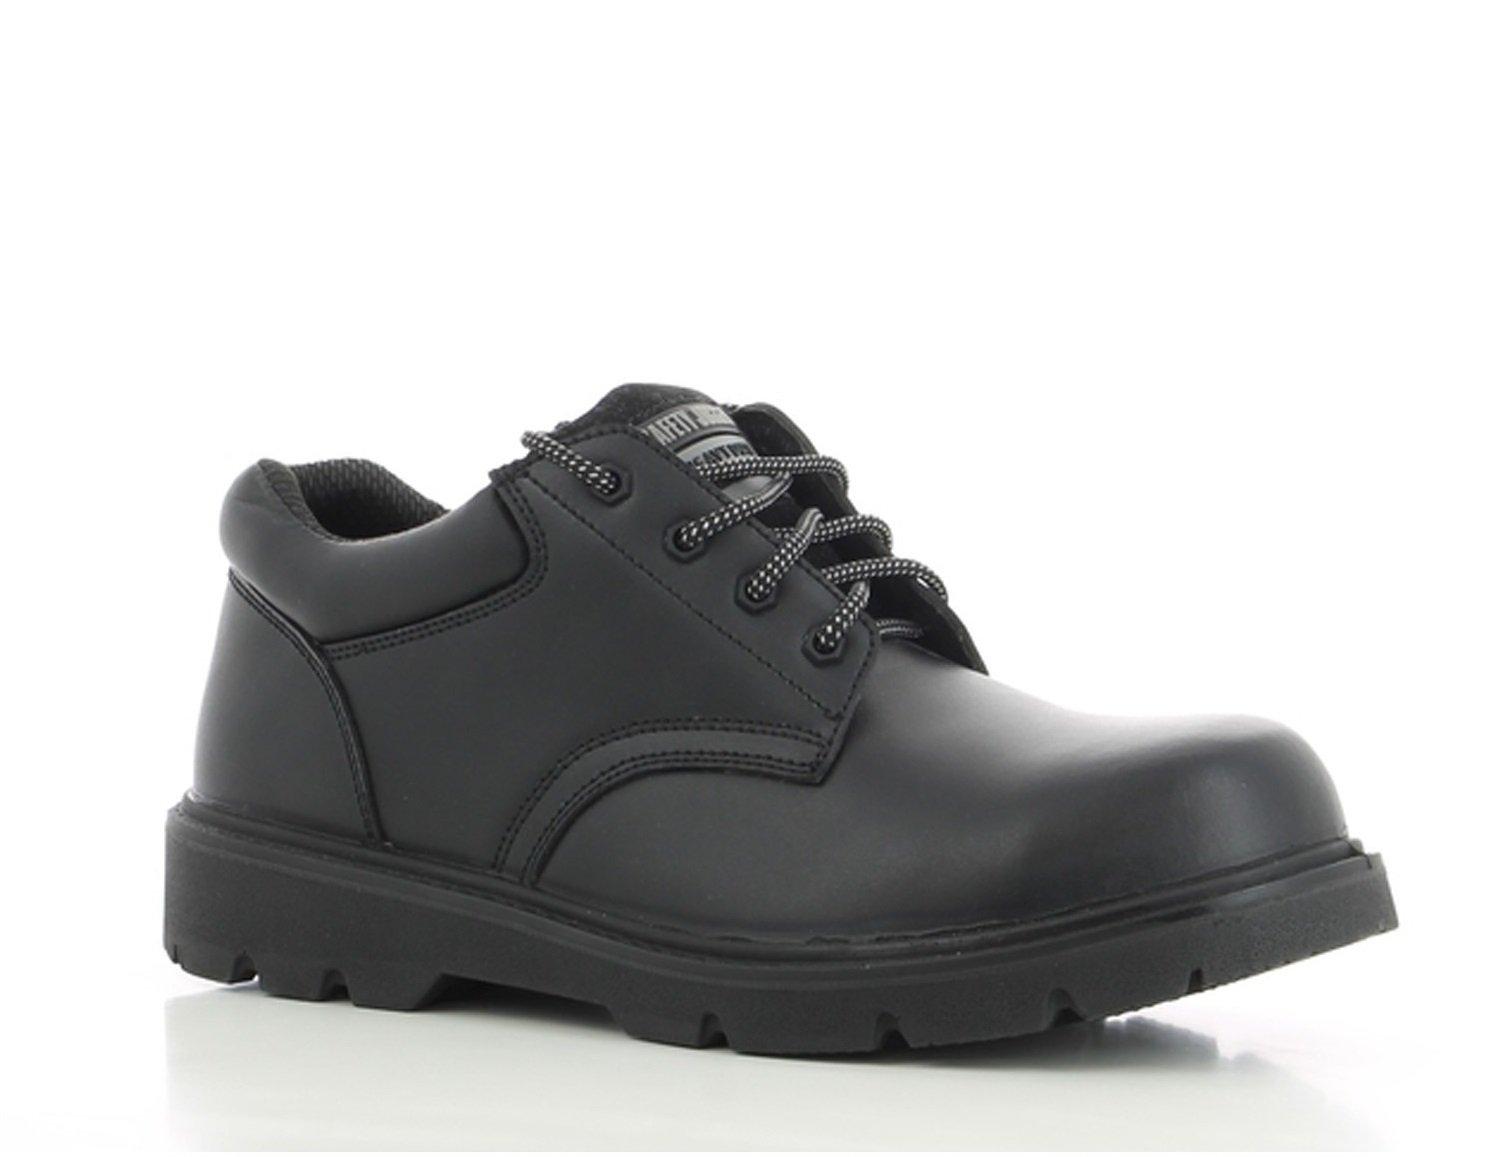 Giày bảo hộ jogger X1110 S3 SRC